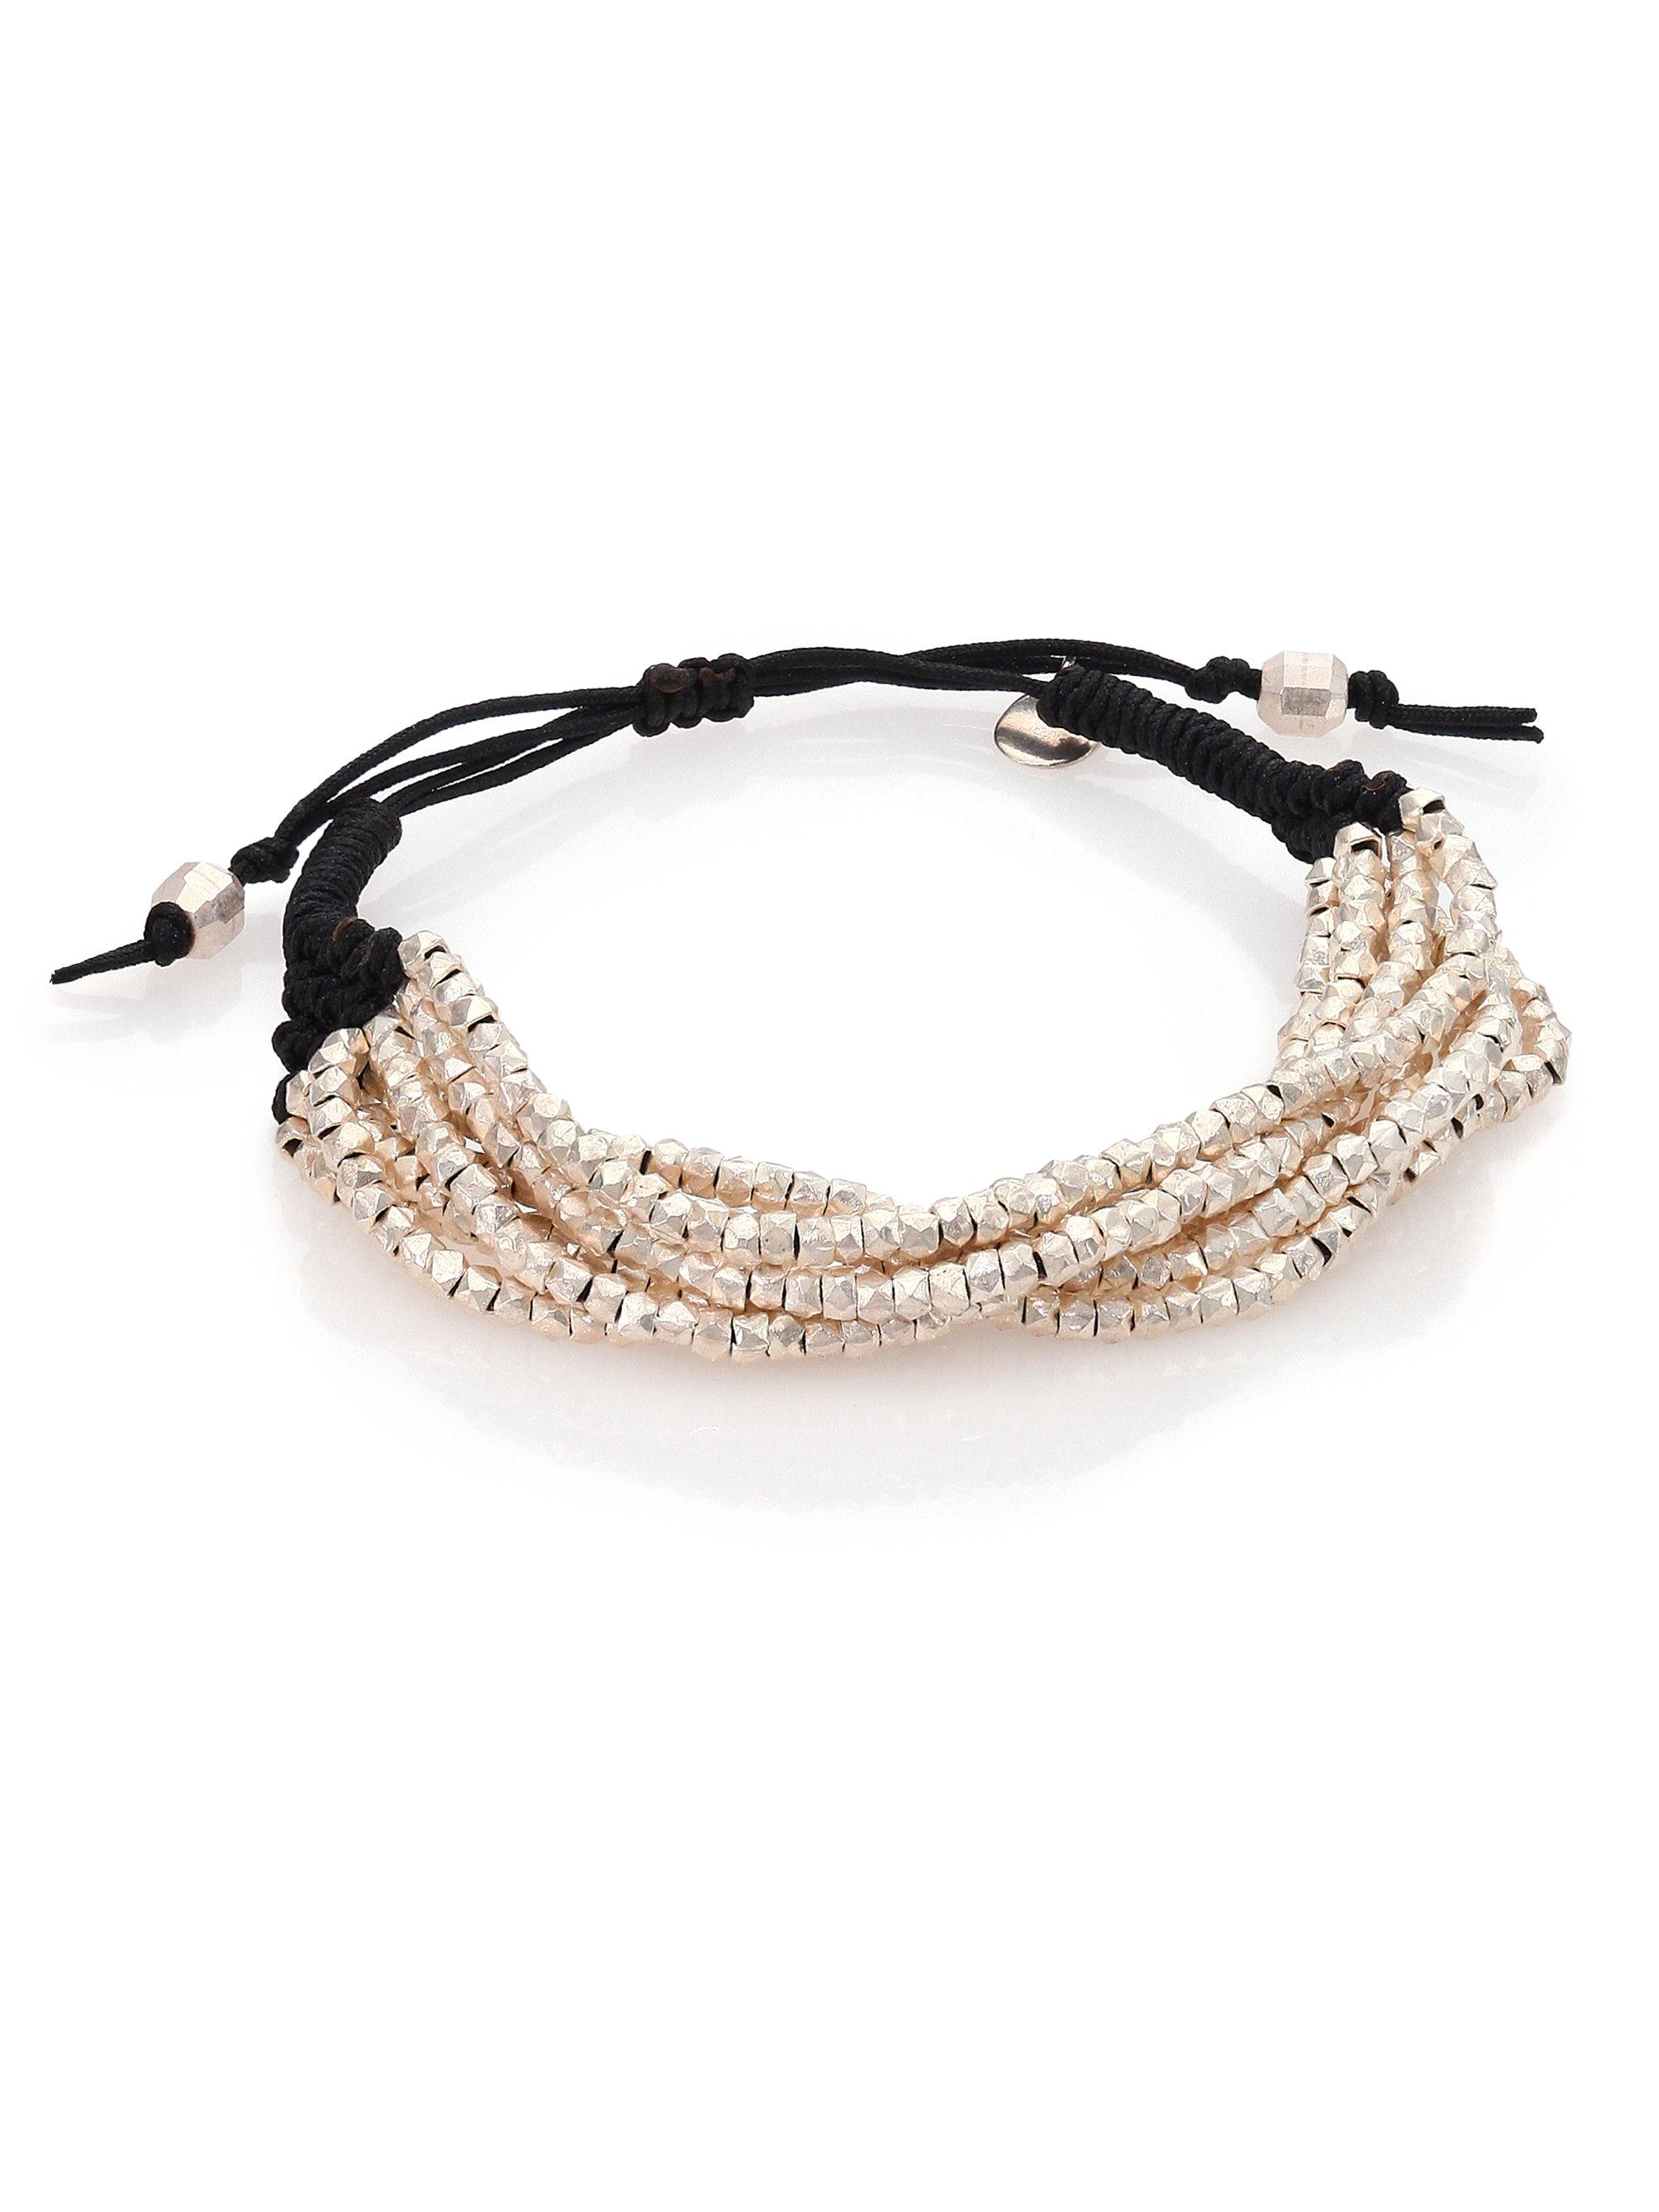 Chan Luu Multi-Strand Beaded Bracelet a5KTPW4Od